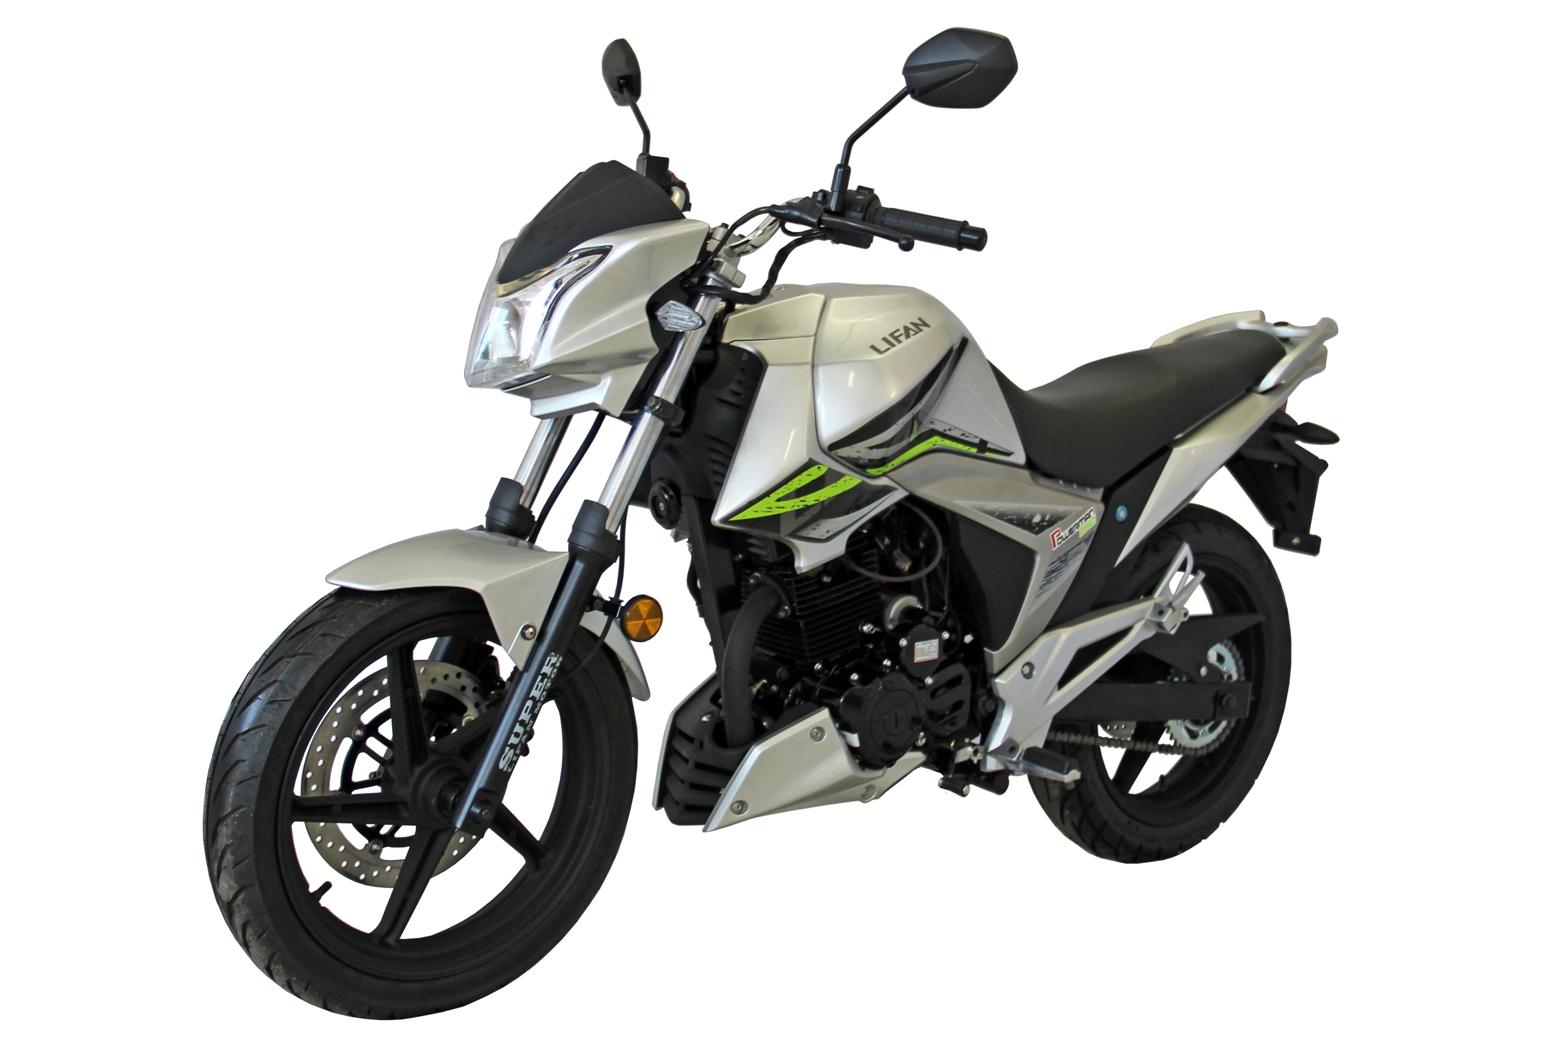 МОТОЦИКЛ LIFAN LF250-3A  Grey Luster ― Артмото - купить квадроцикл в украине и харькове, мотоцикл, снегоход, скутер, мопед, электромобиль